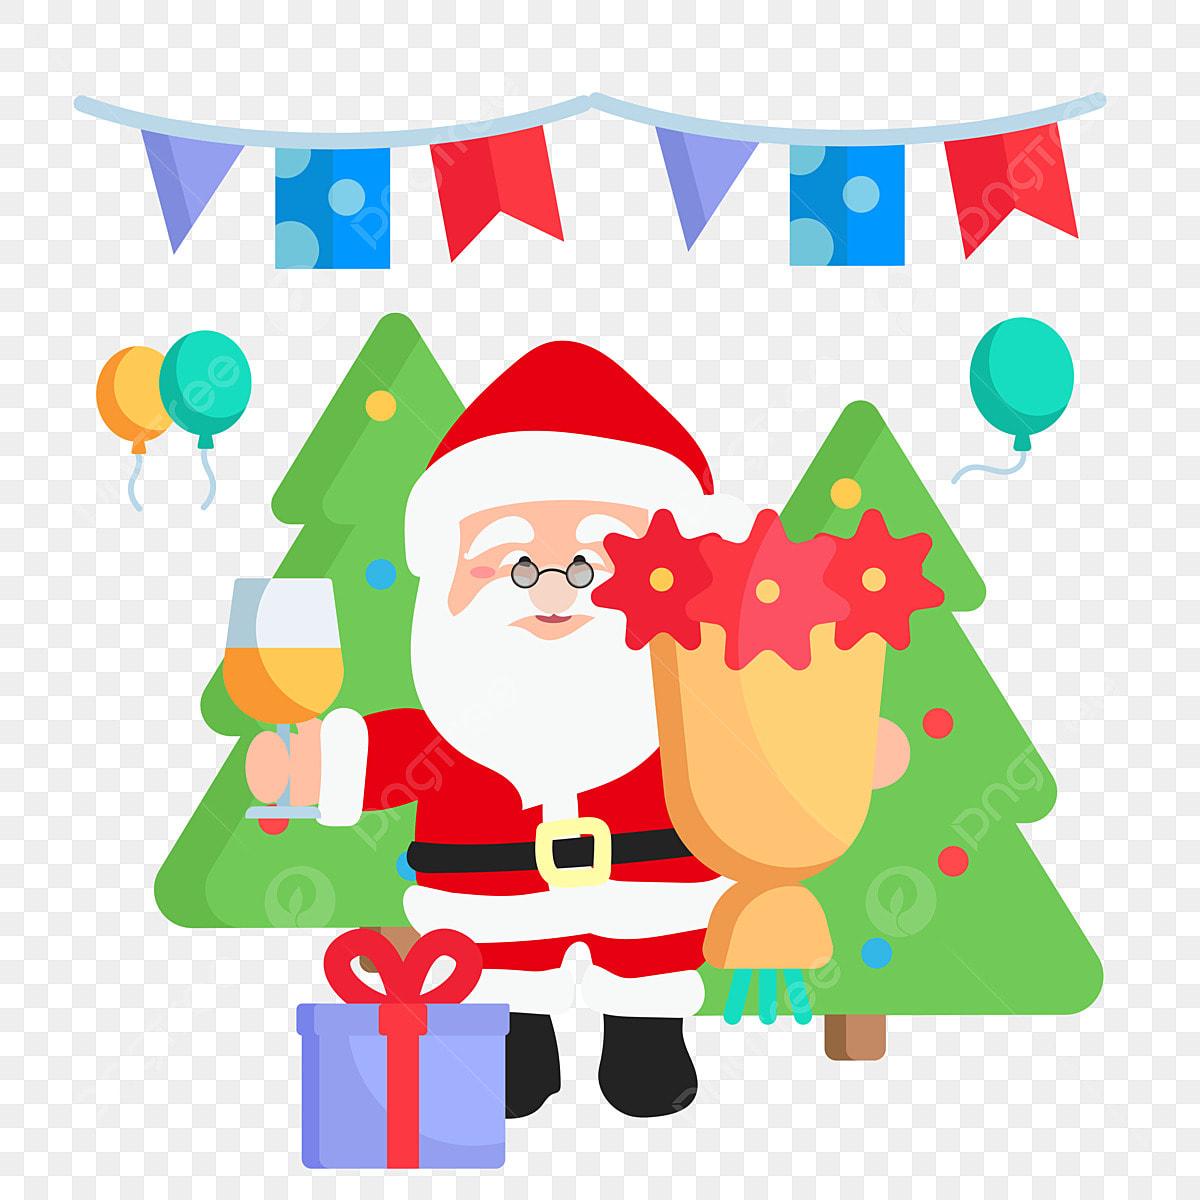 Christmas Celebration Cartoon Images.Christmas Celebration Santa Claus Joy Christmas Tree Gift